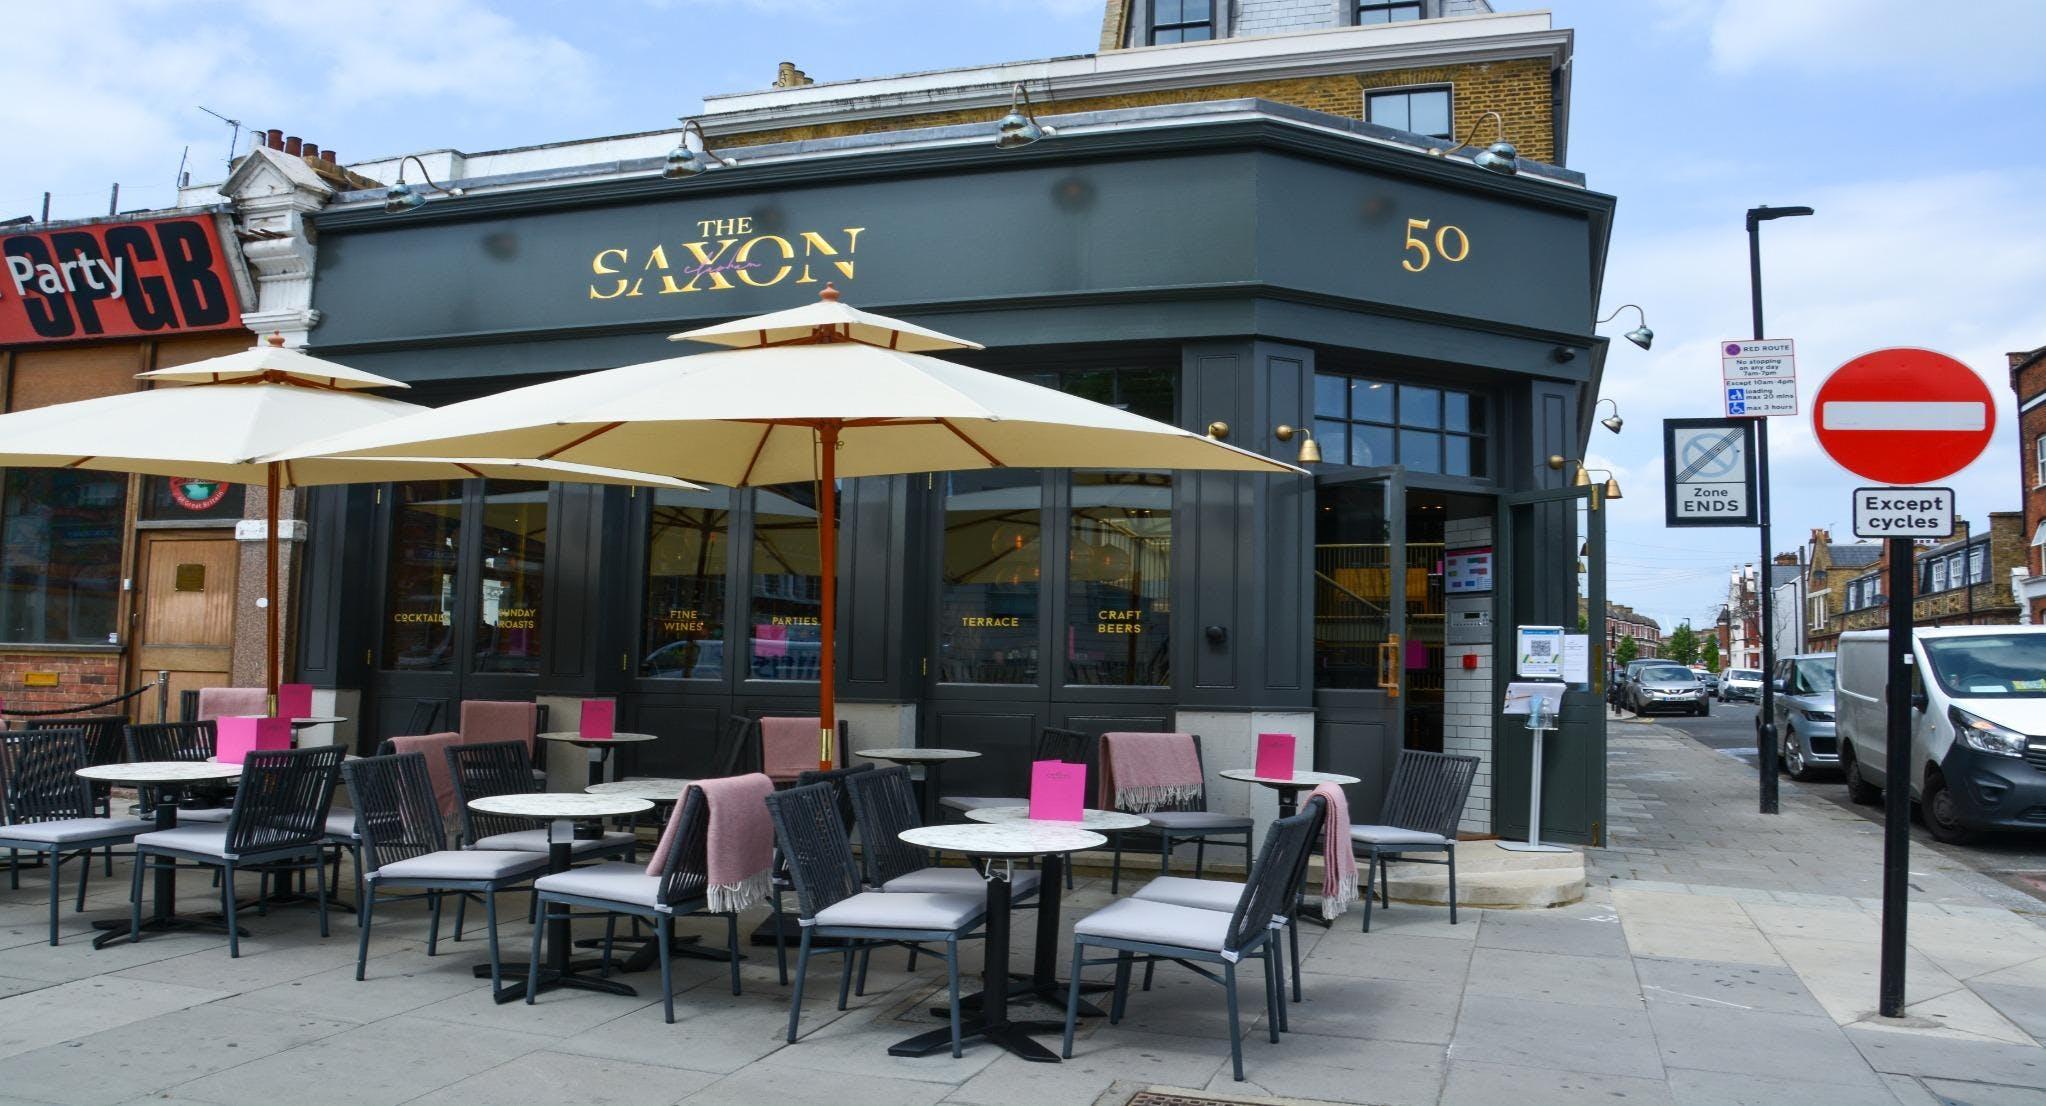 Photo of restaurant The Saxon in Clapham, London